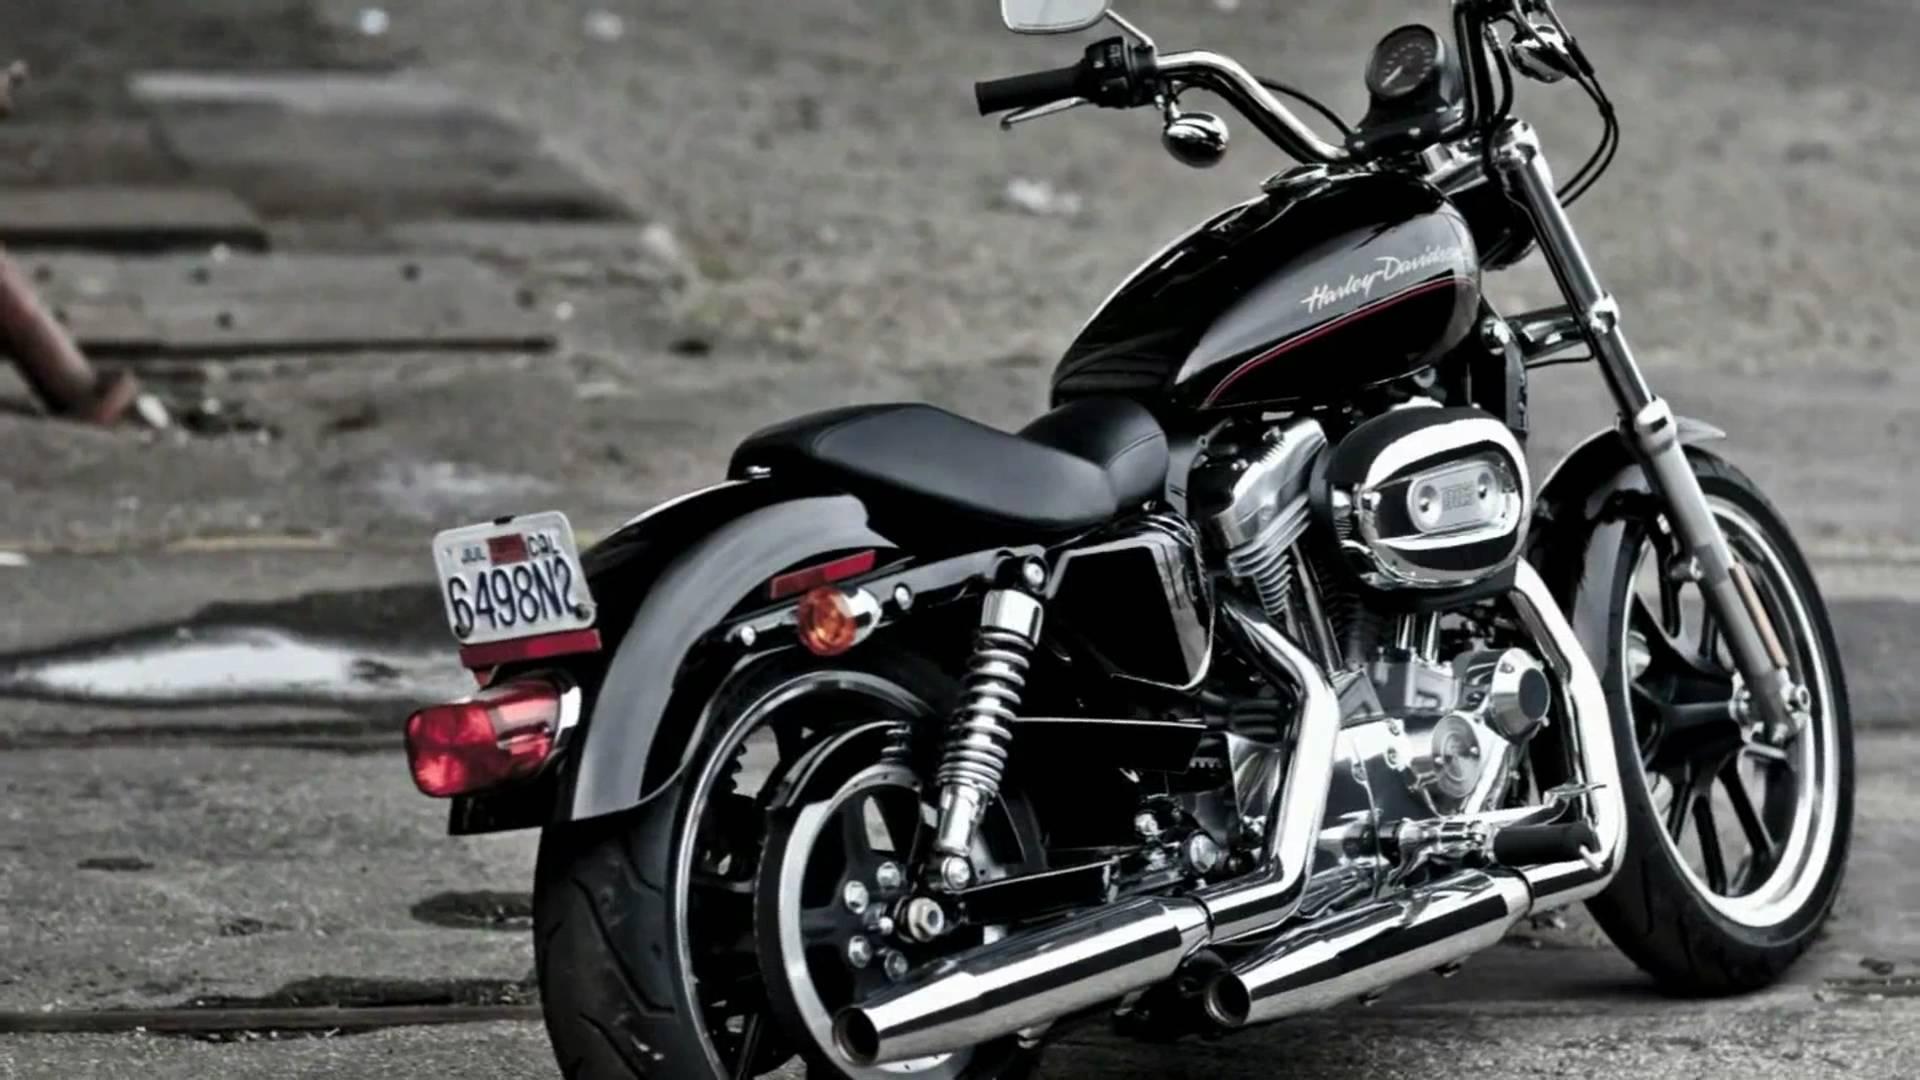 Harley Davidson Xl883 Superlow 1080P Hd Wallpapers 1920x1080